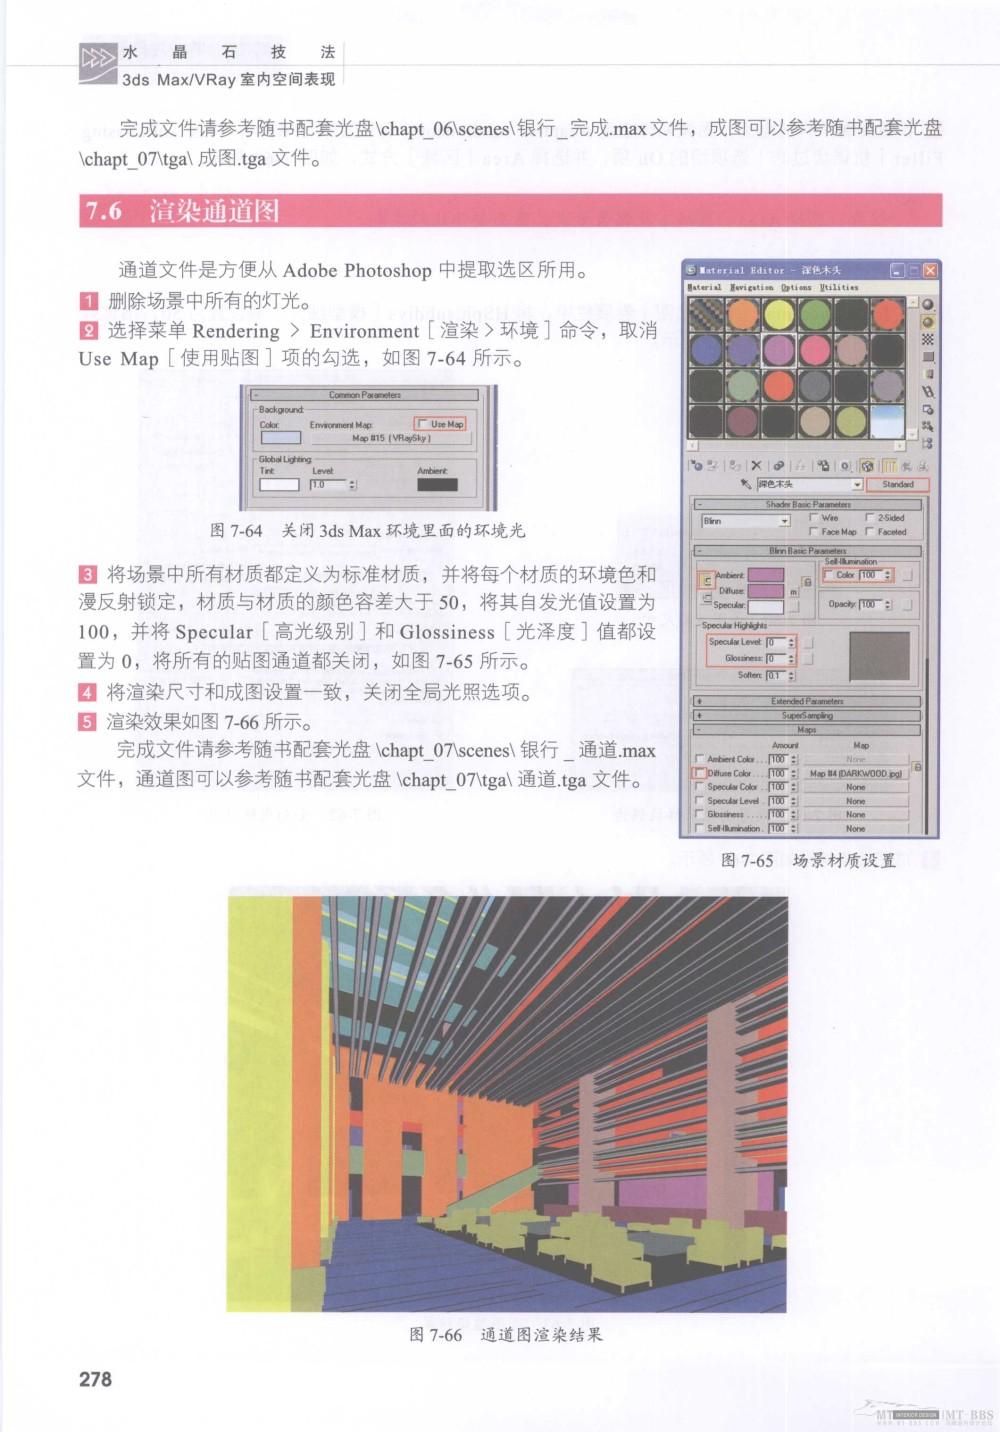 水晶石技法-3ds_Max&VRay室内空间表现_水晶石技法-3ds_Max&VRay室内空间表现_页面_284.jpg